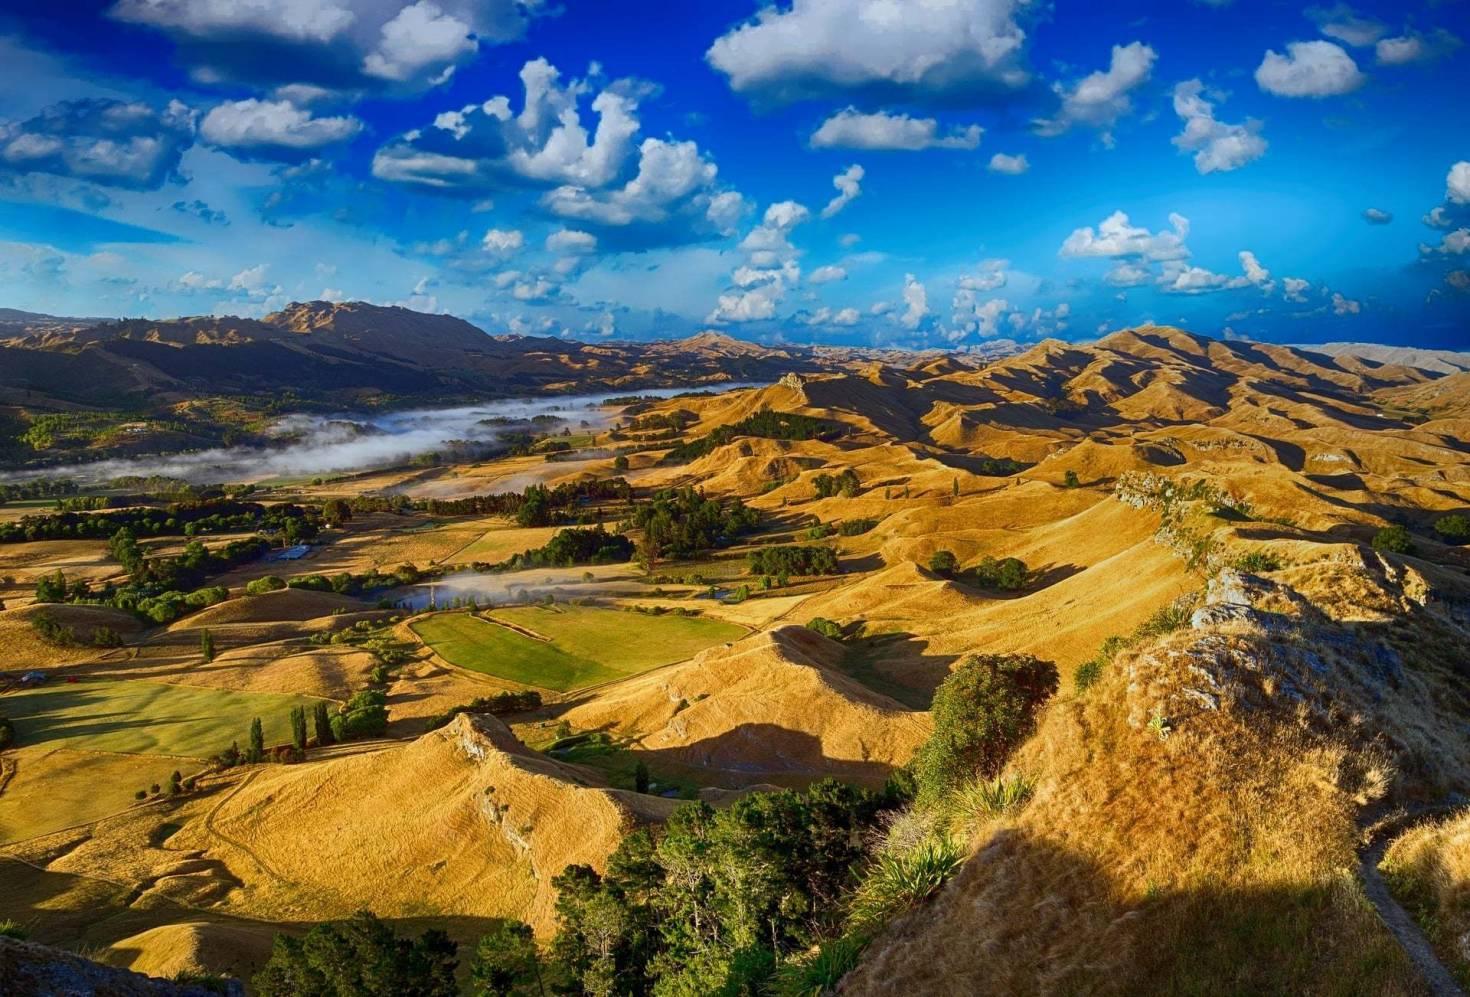 Landscape Overlook